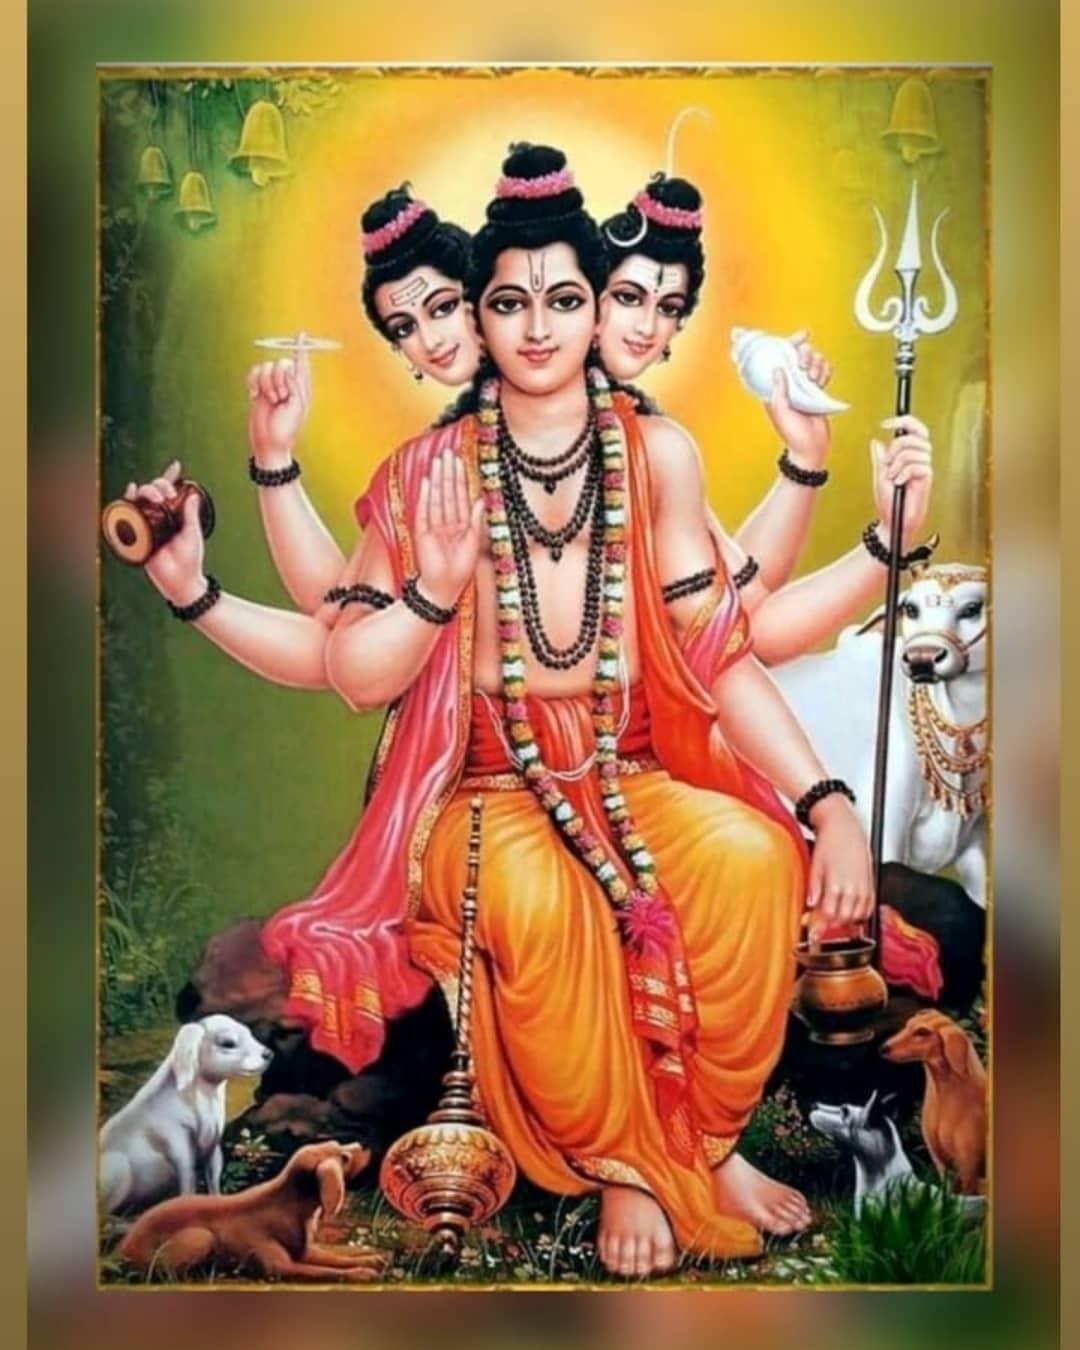 Download Shree Gurudev Datta Full Hd Images